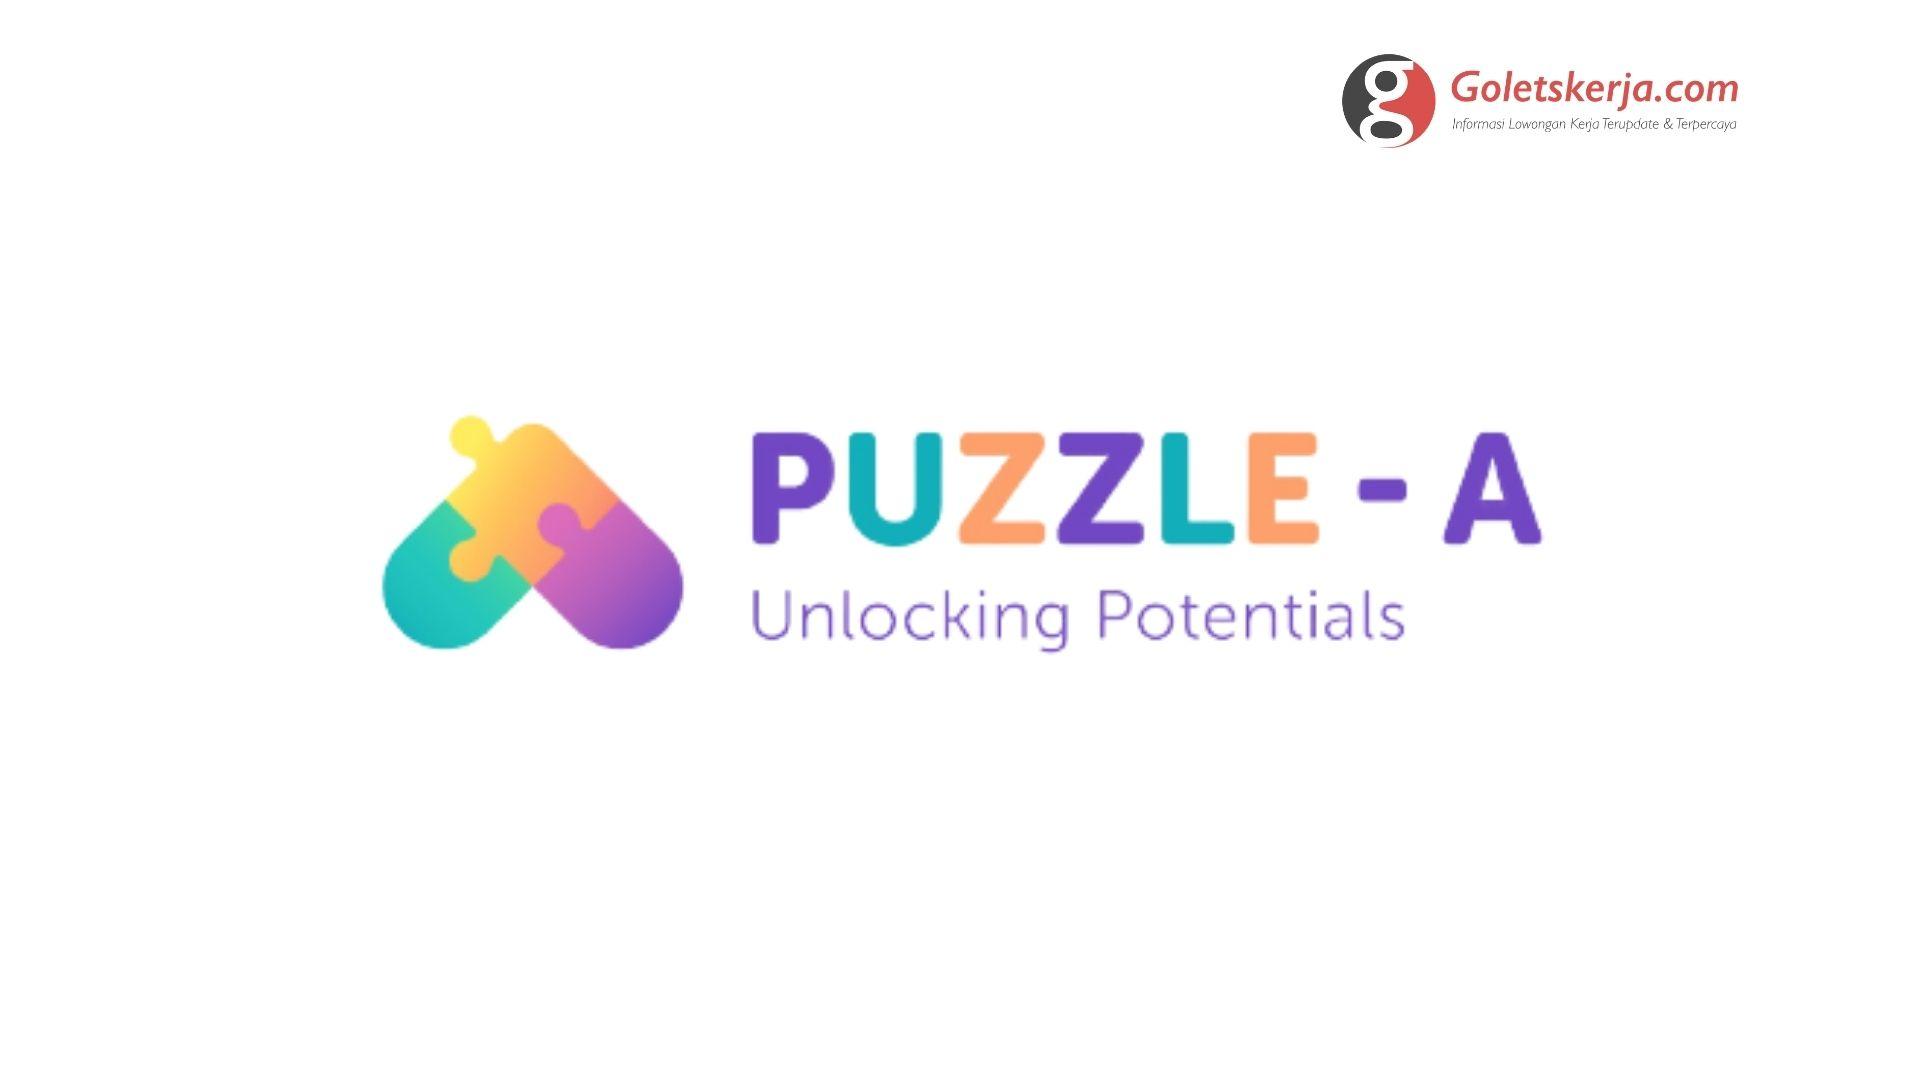 Lowongan Kerja Puzzle-A